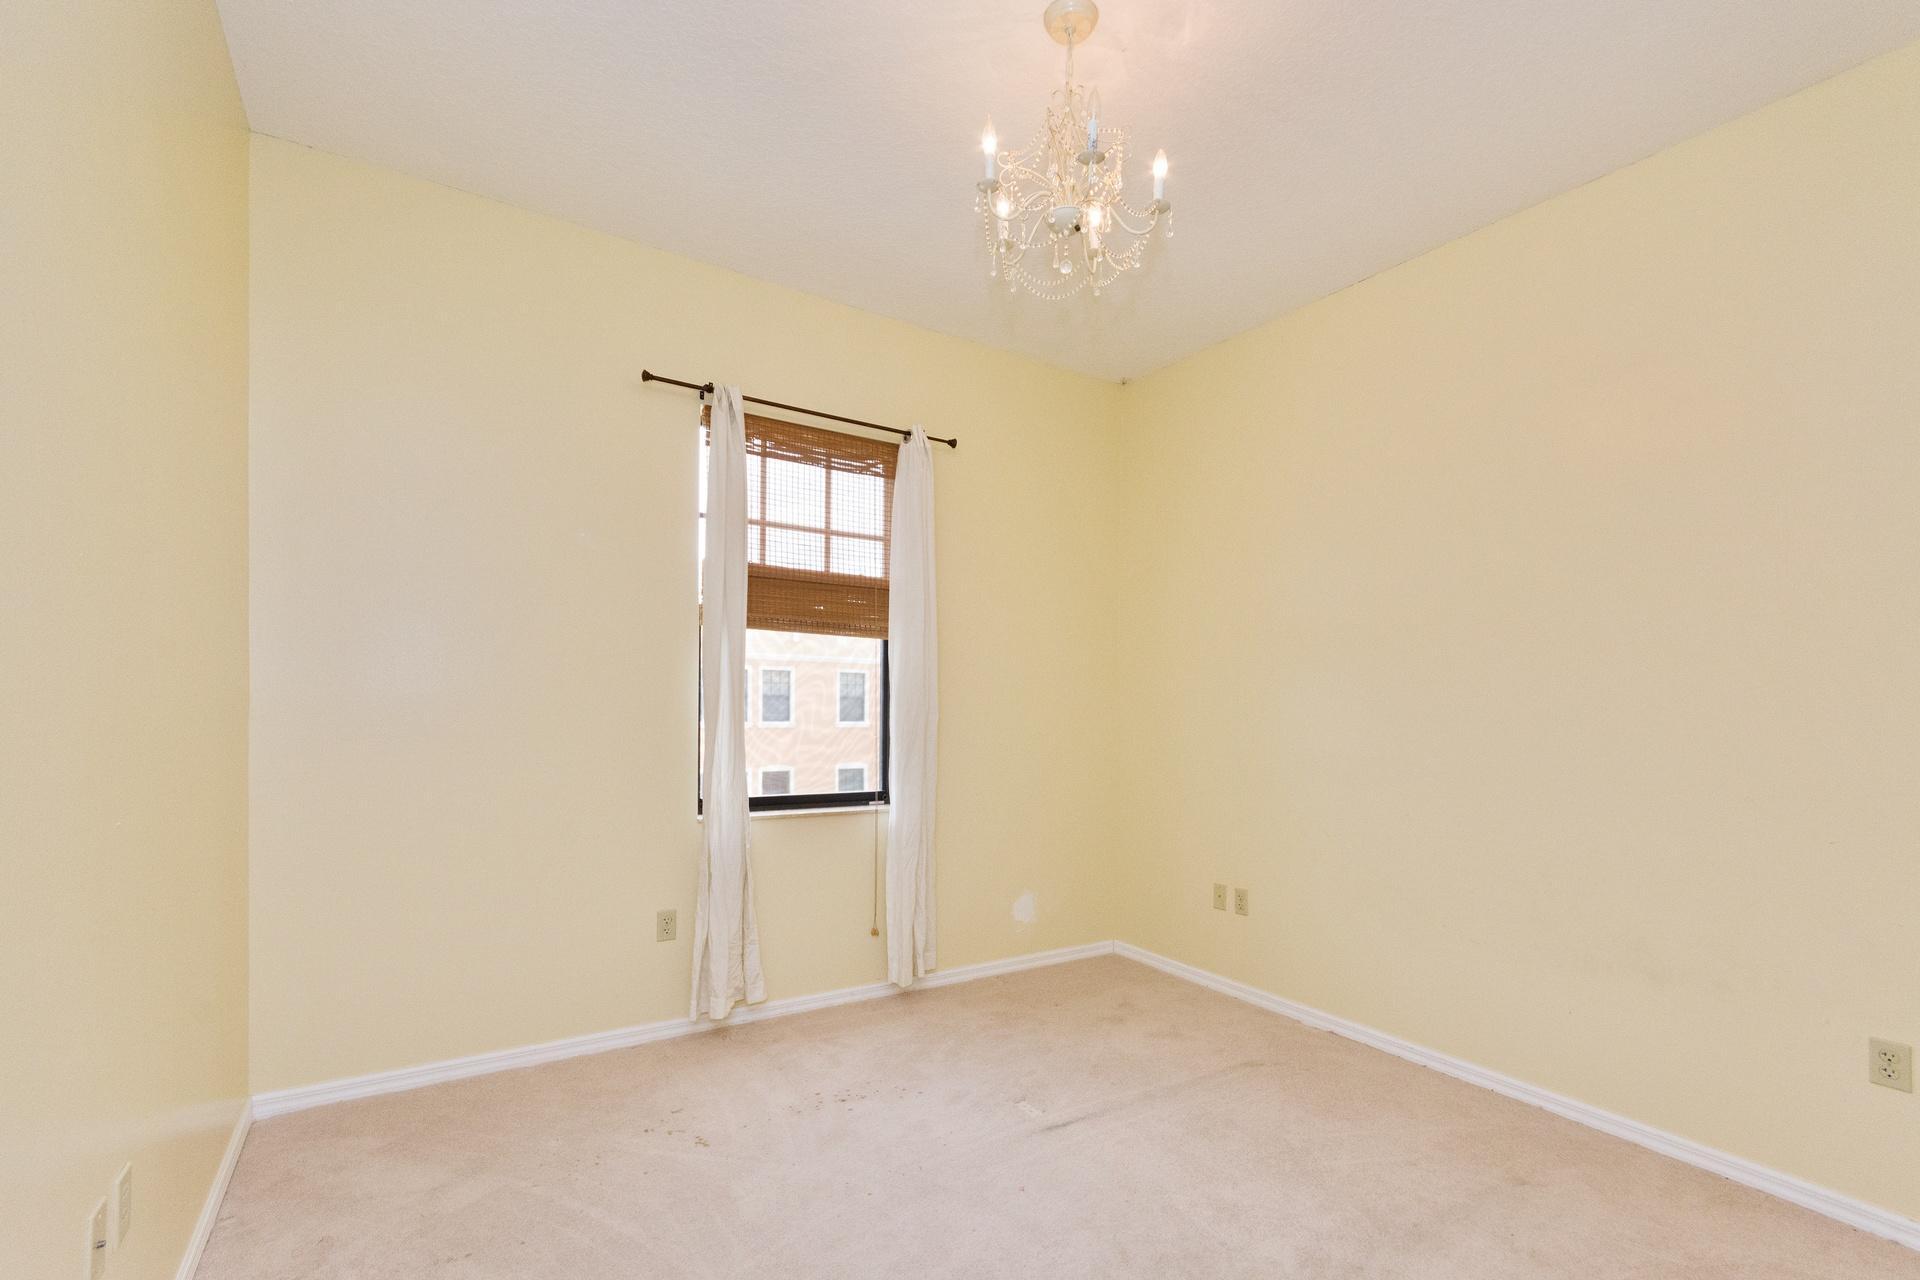 Bedroom 2-before new flooring